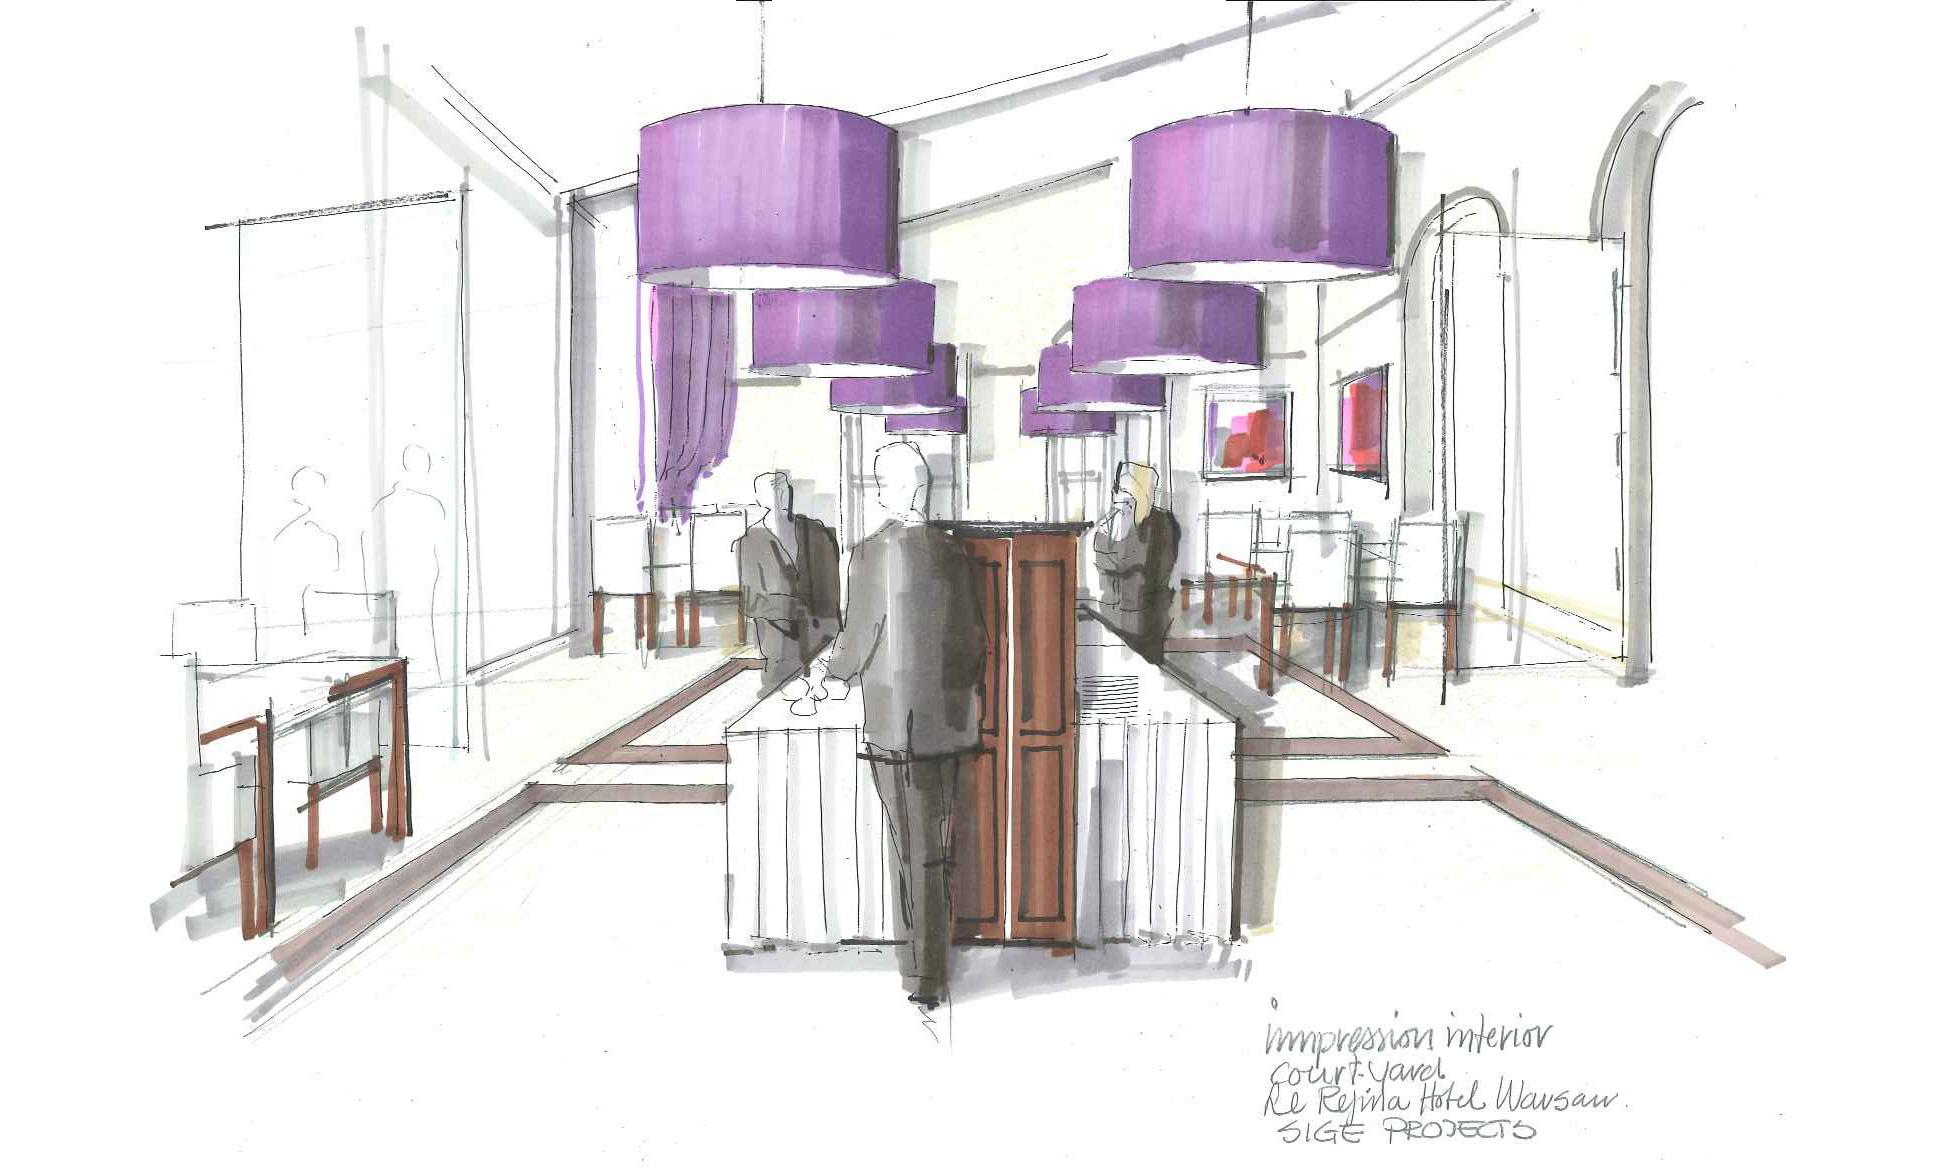 Sip hofstede interieur ontwerpen for Interieur ontwerp